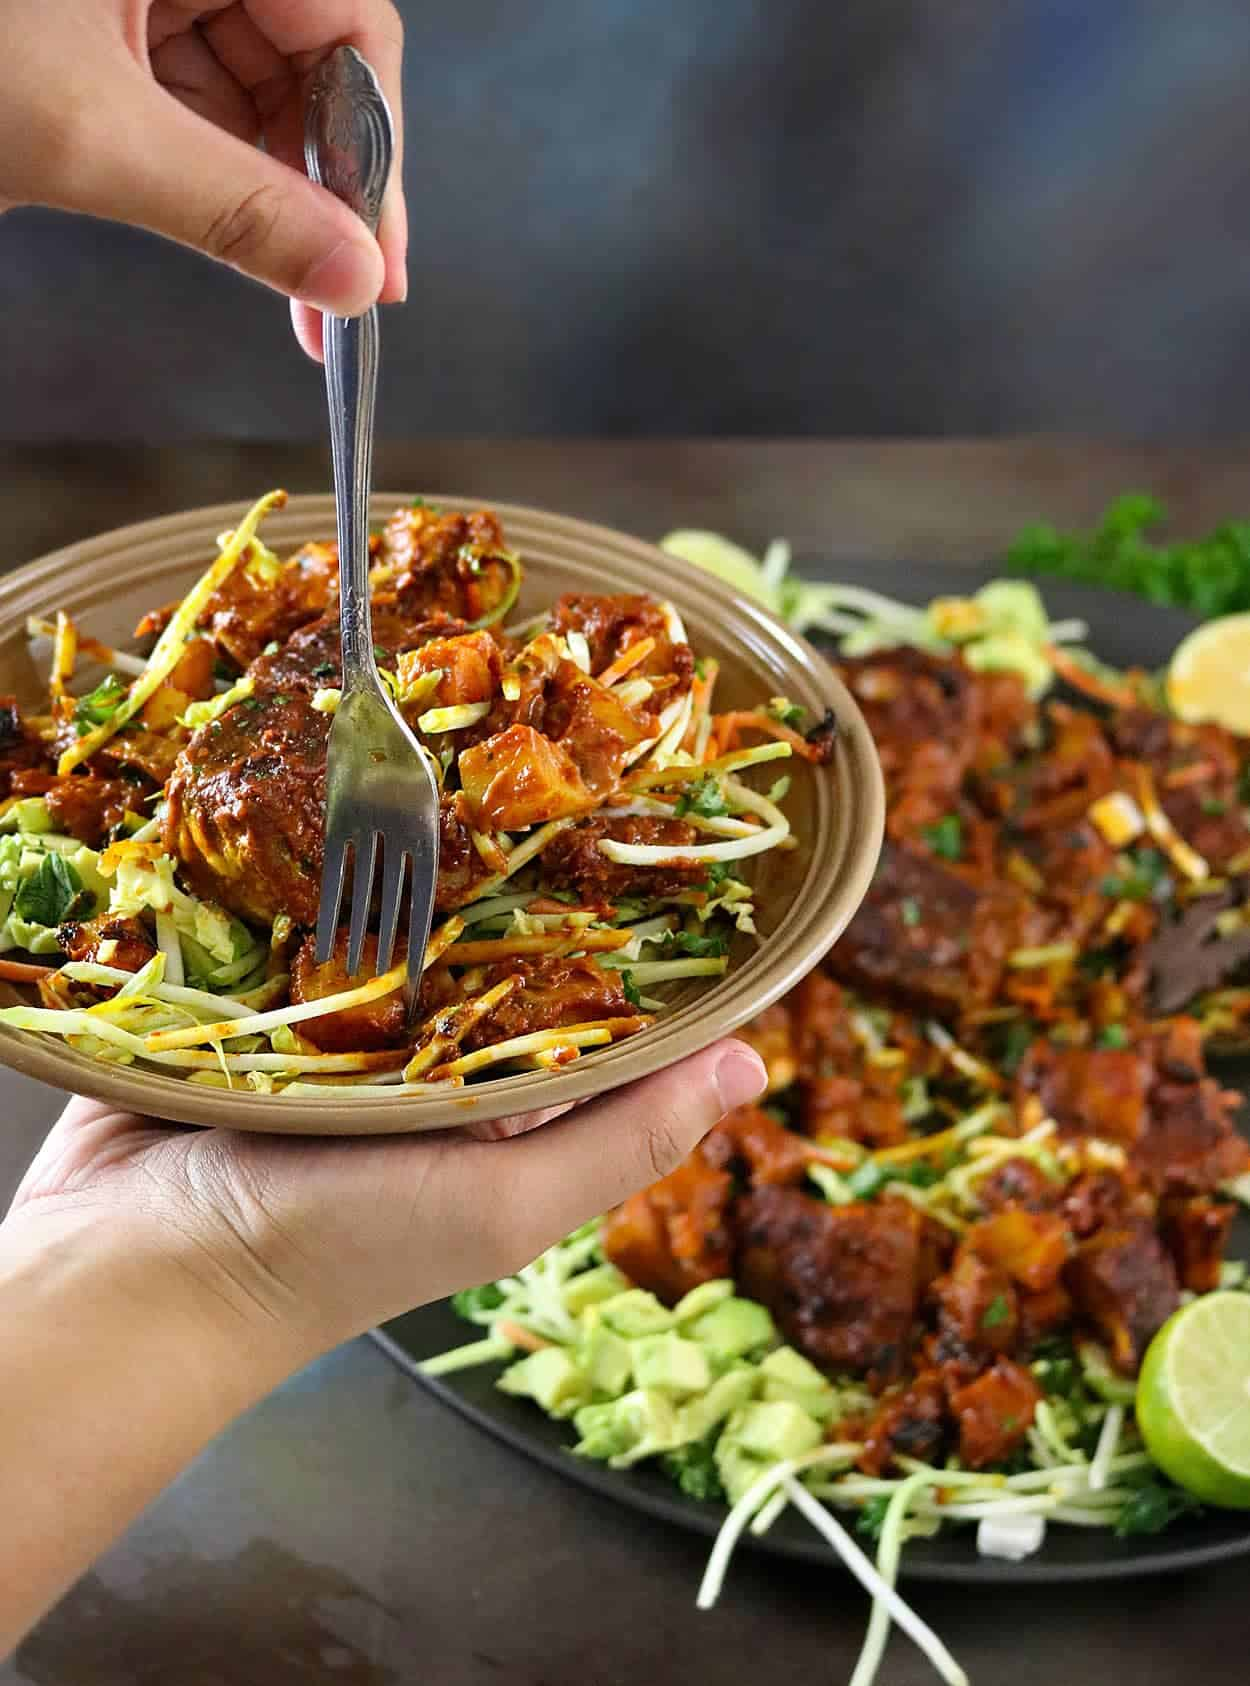 Potato & Salmon Dry Curry - Recipe available on RunninSrilankan.com